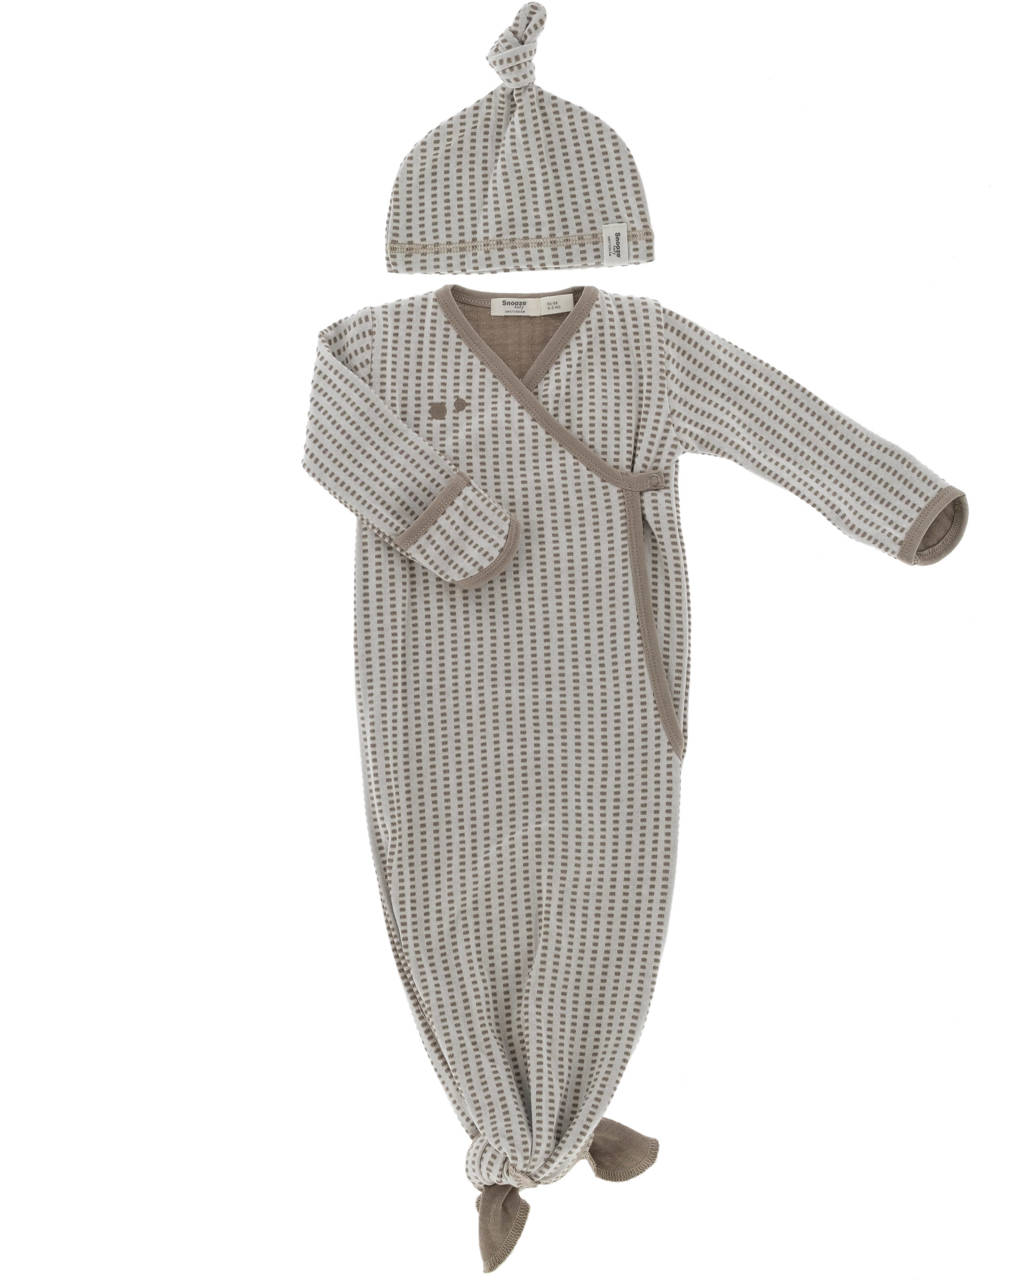 Snoozebaby baby knoopslaapzak + mutsje 0-3 mnd Warm Brown, Bruin/lichtbruin, 0-3 maand